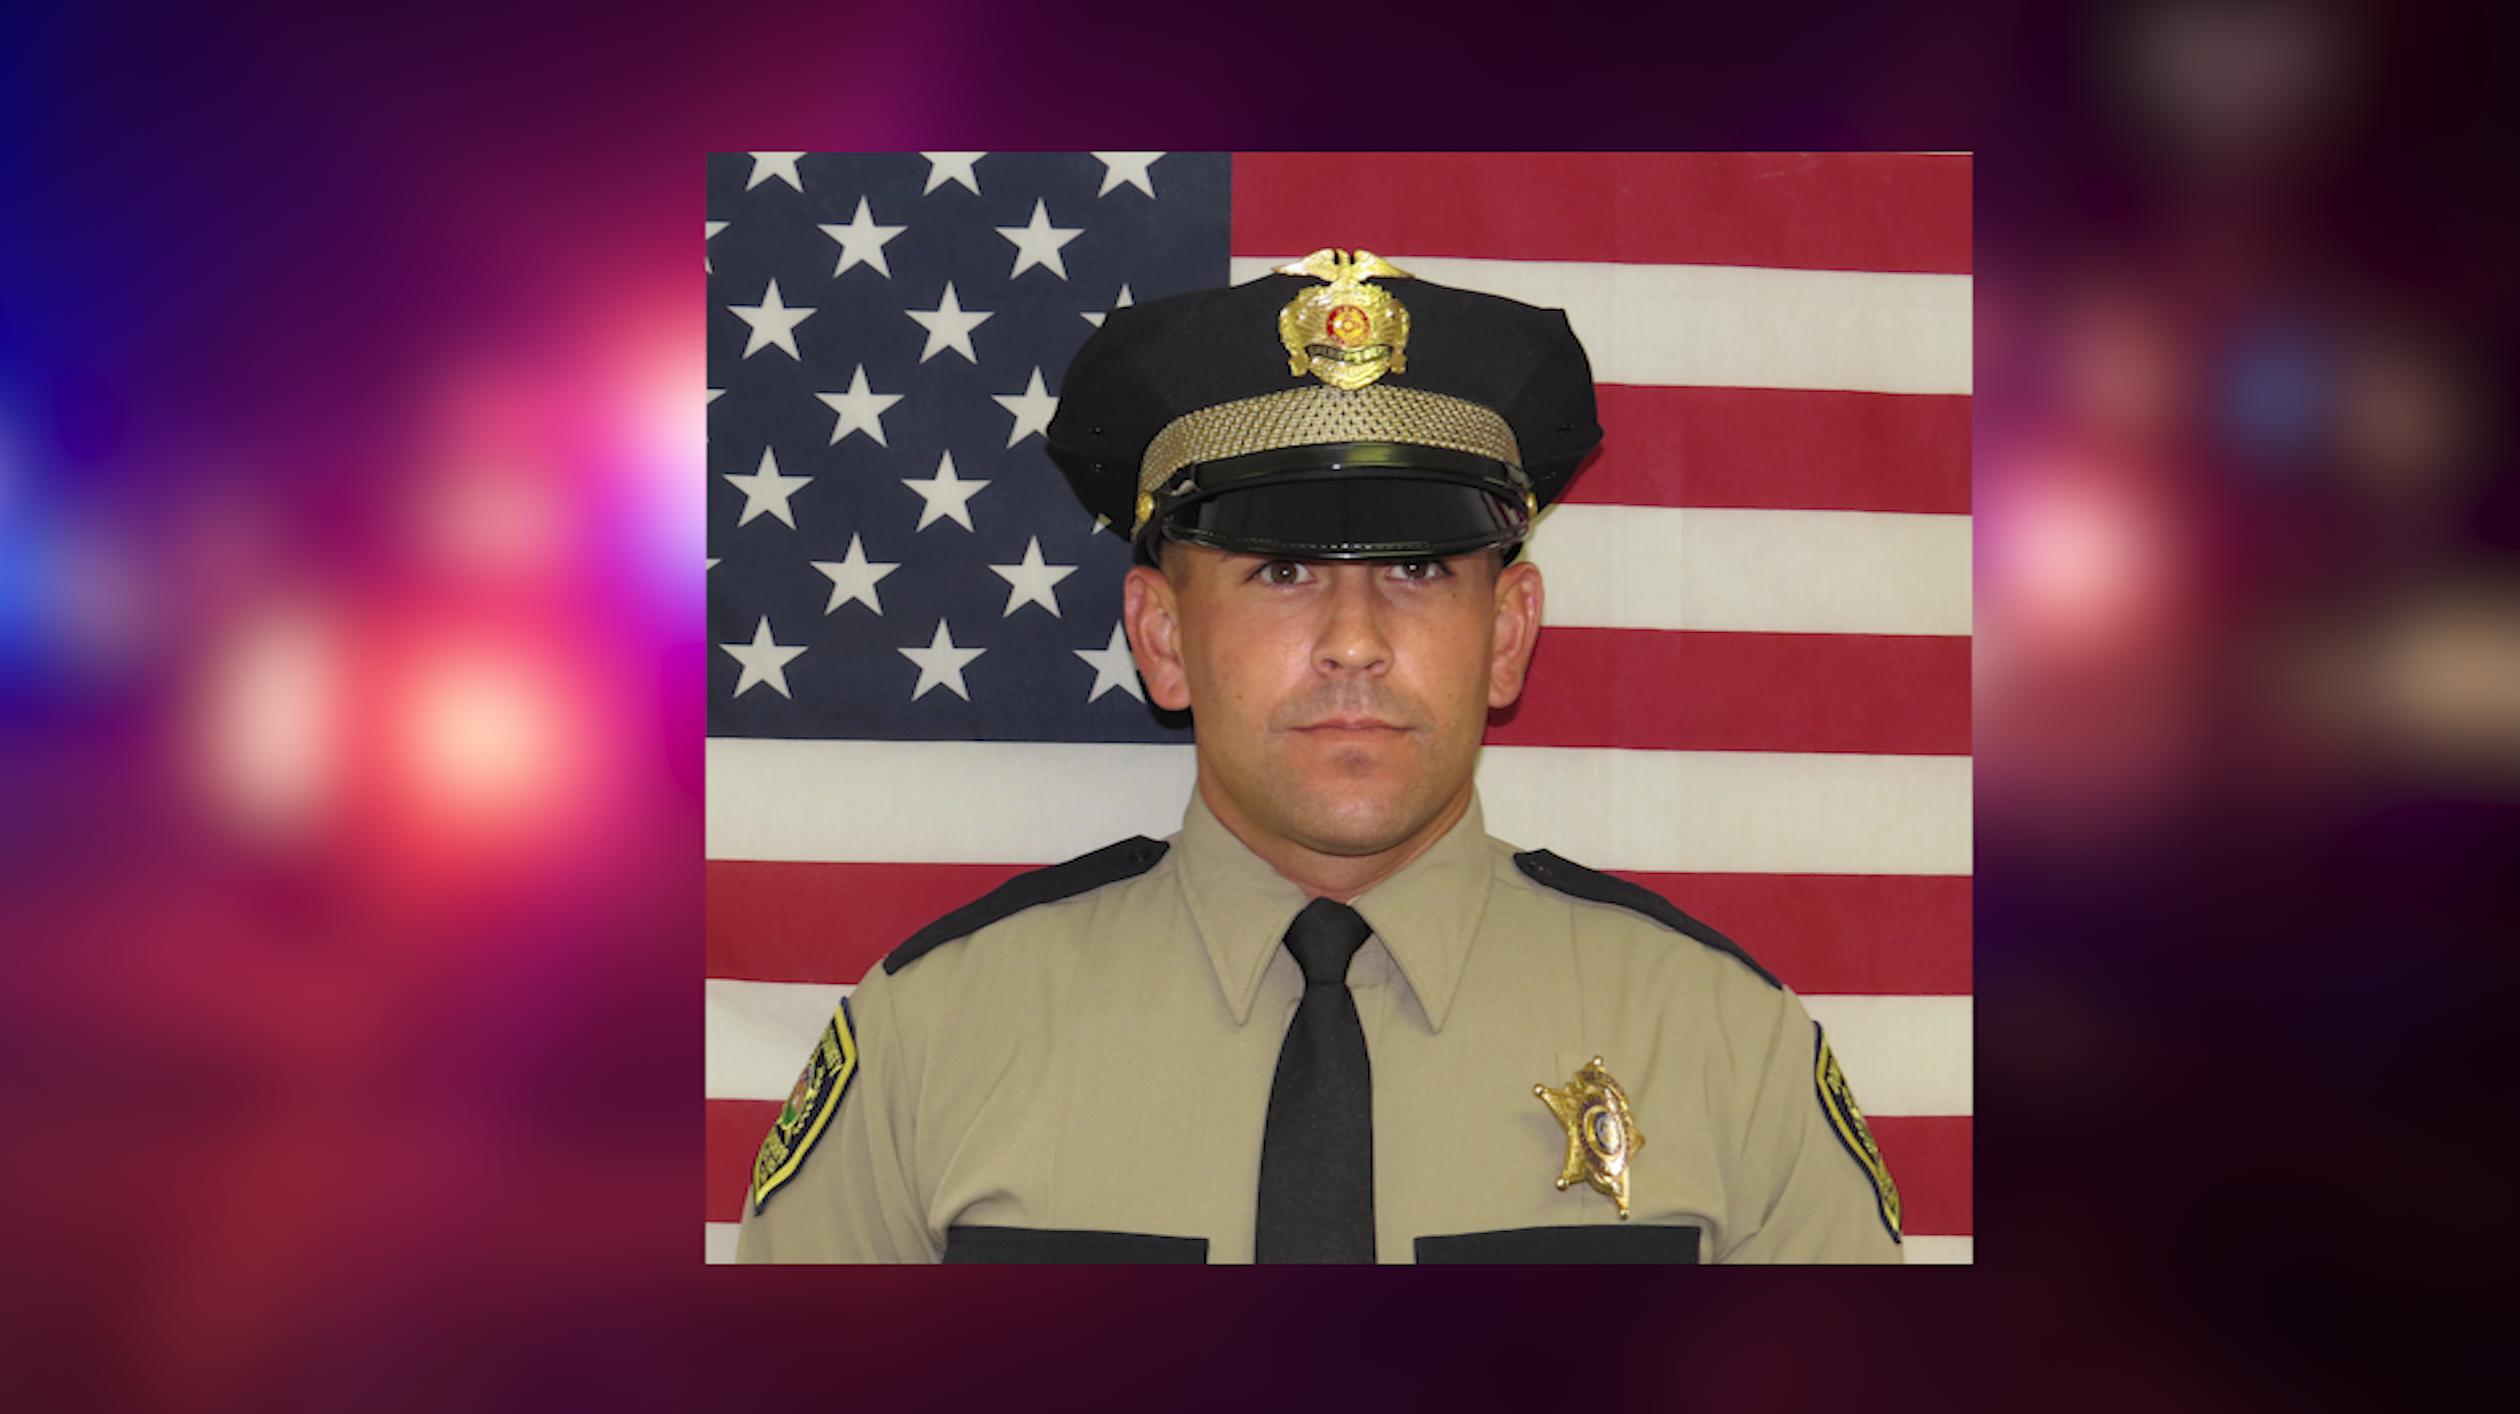 Doña Ana County Sheriff's Deputy Christopher Patton